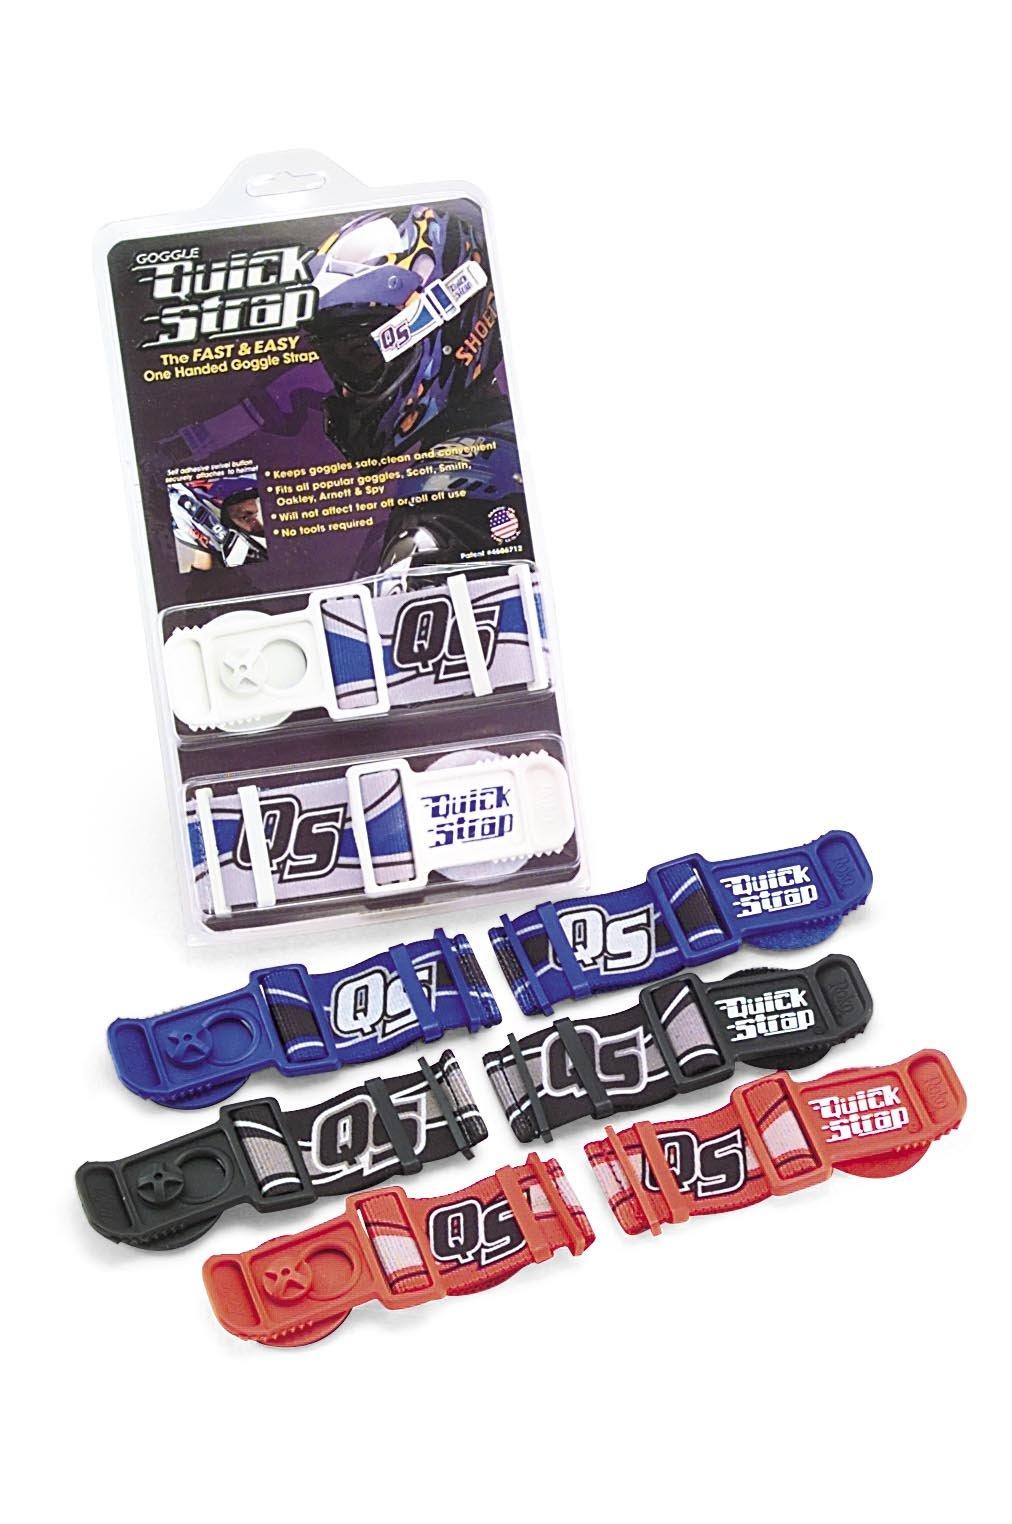 Roko Sports Goggle Quick Straps - Black QS-40 BLK